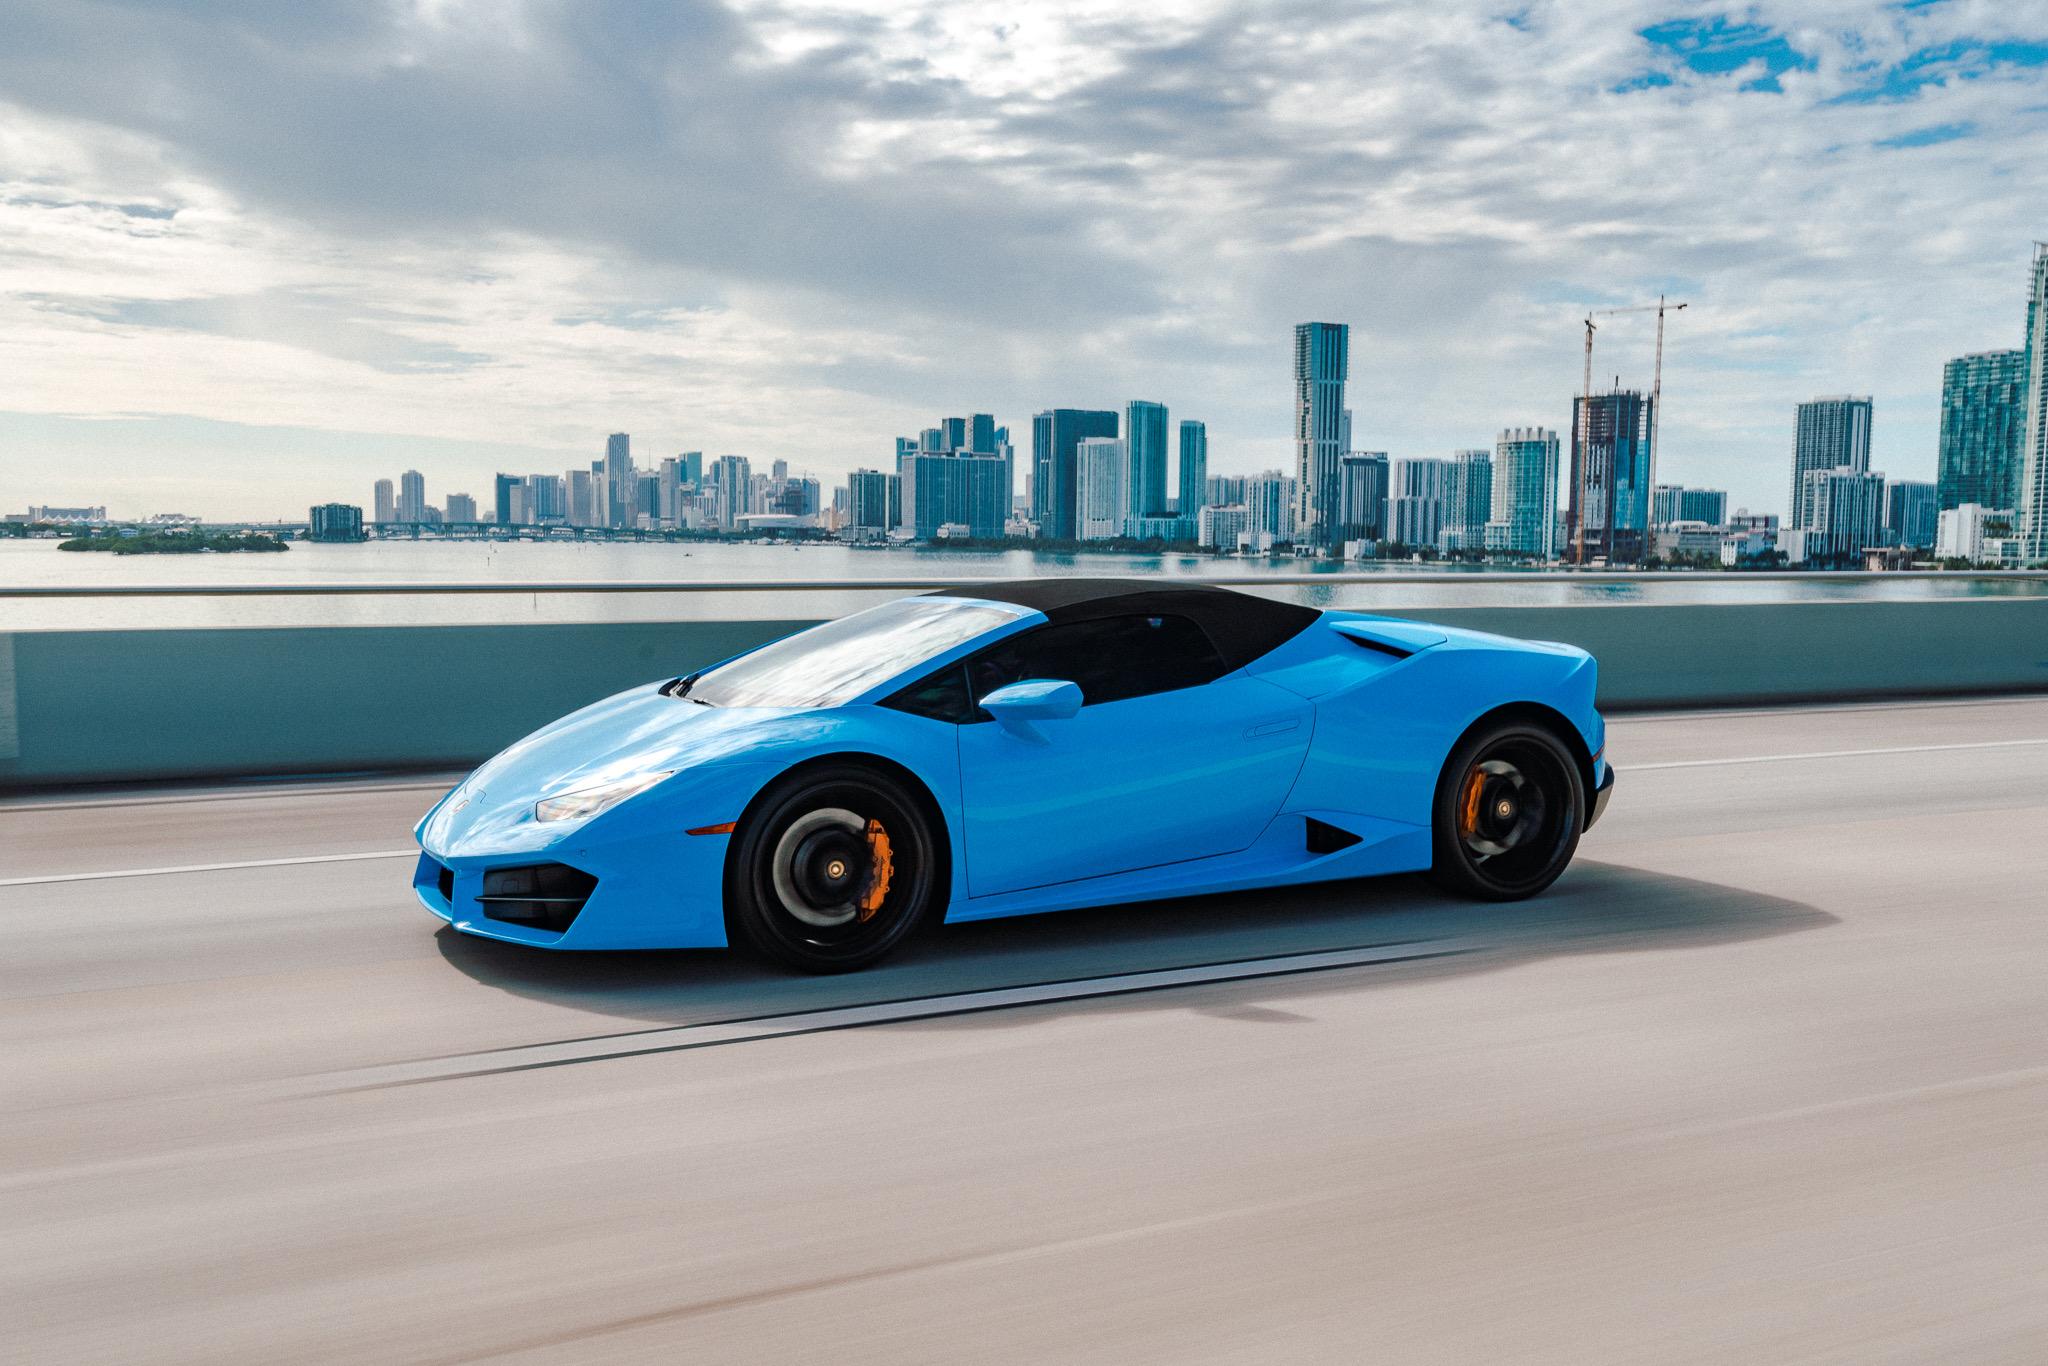 Ecstasy Exotics #1 Rated Miami Rentals